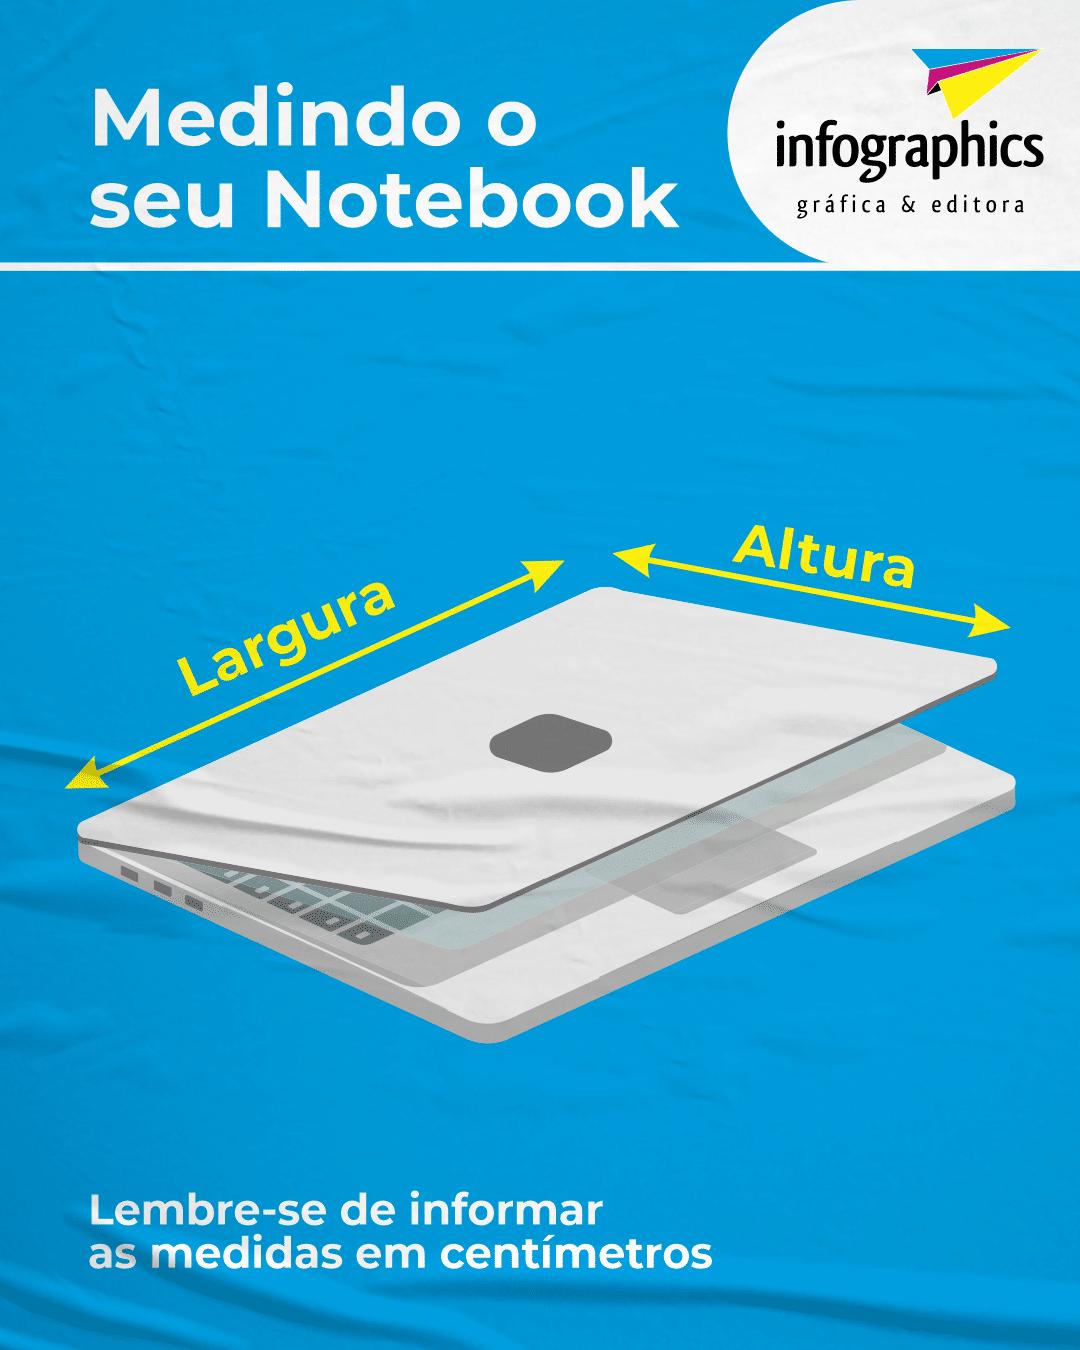 medir-notebook